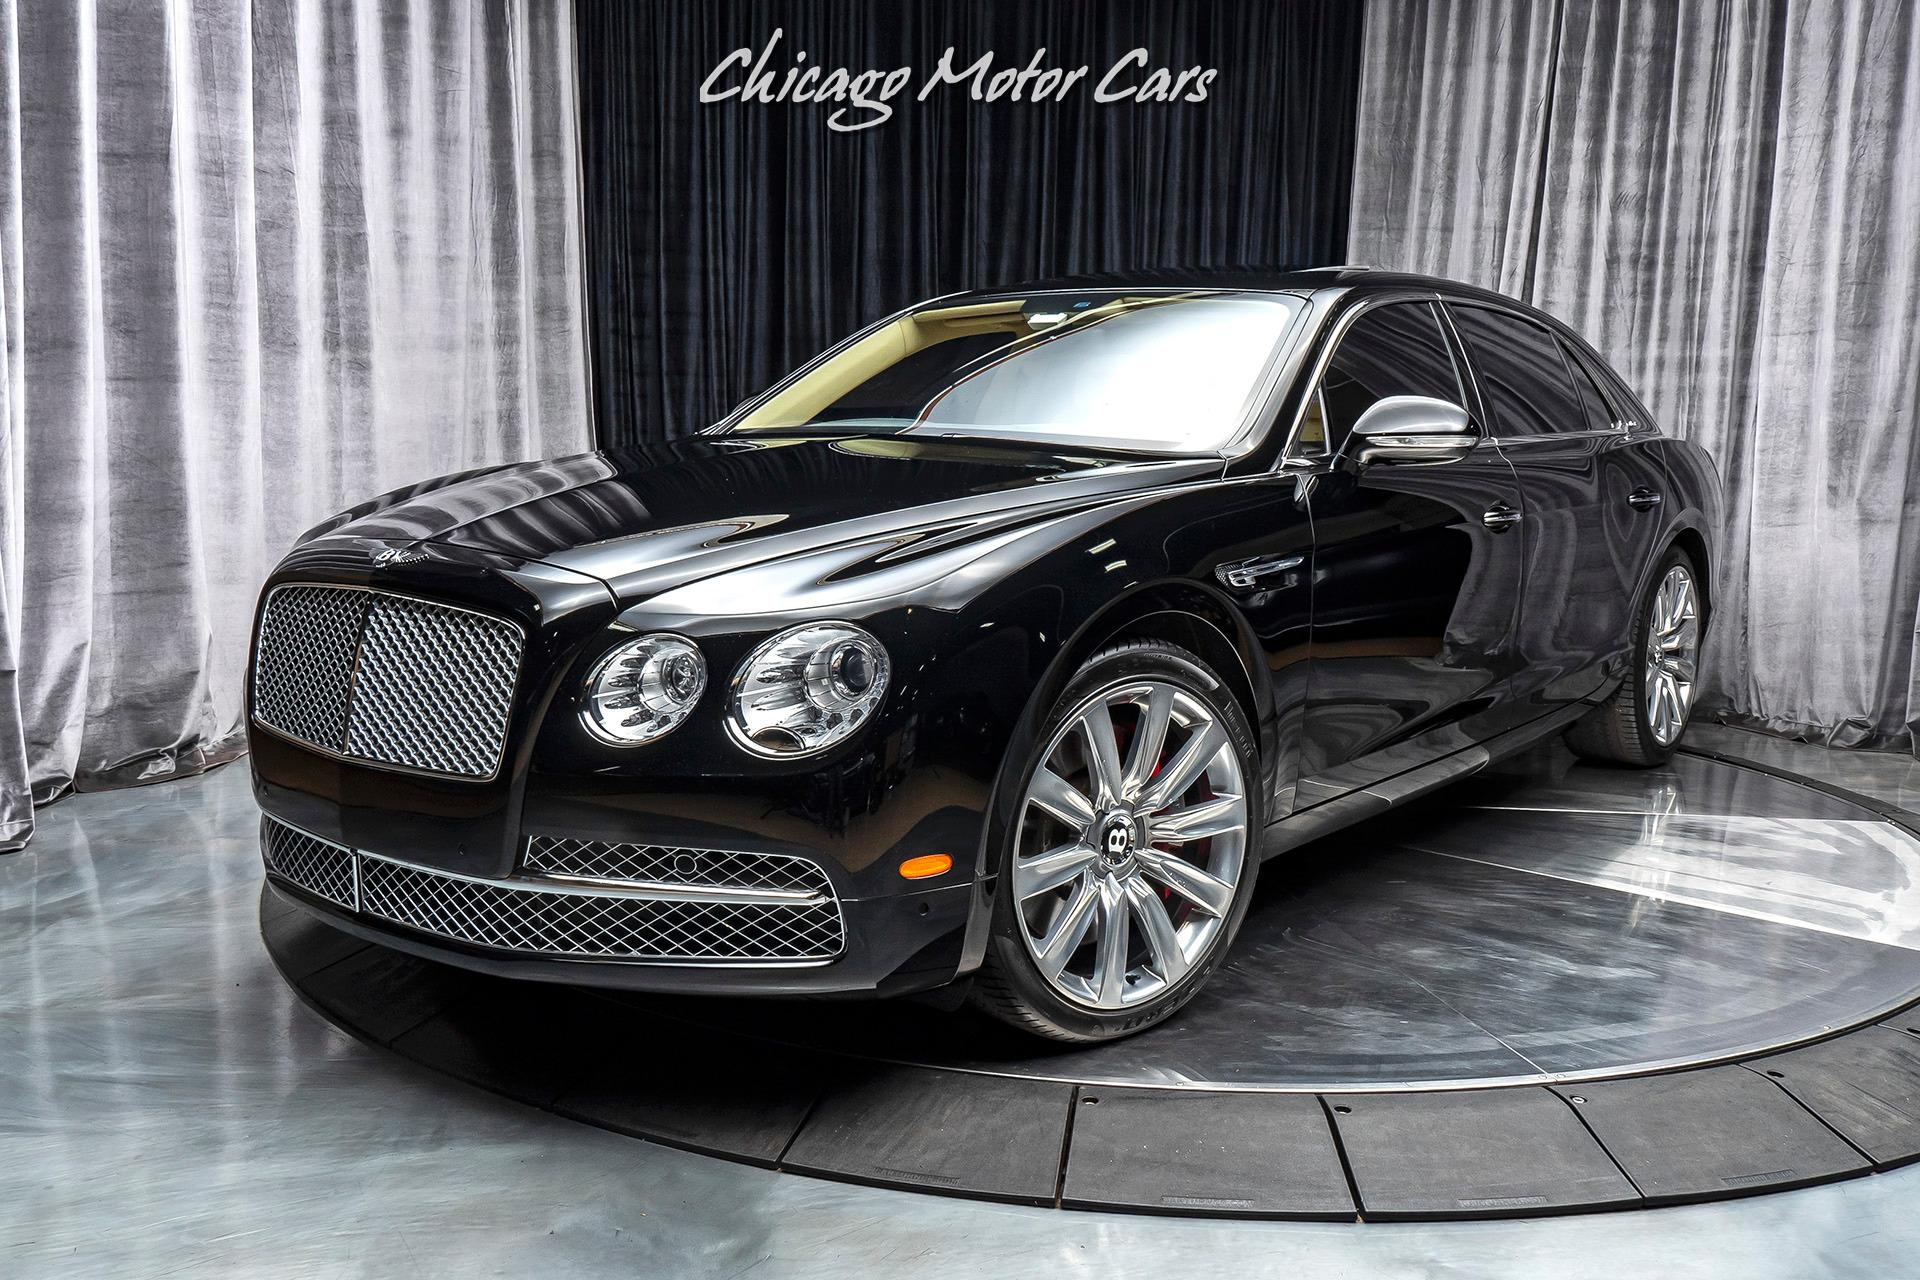 Used-2015-Bentley-Flying-Spur-W12-Sedan-CONTRAST-STITCHING